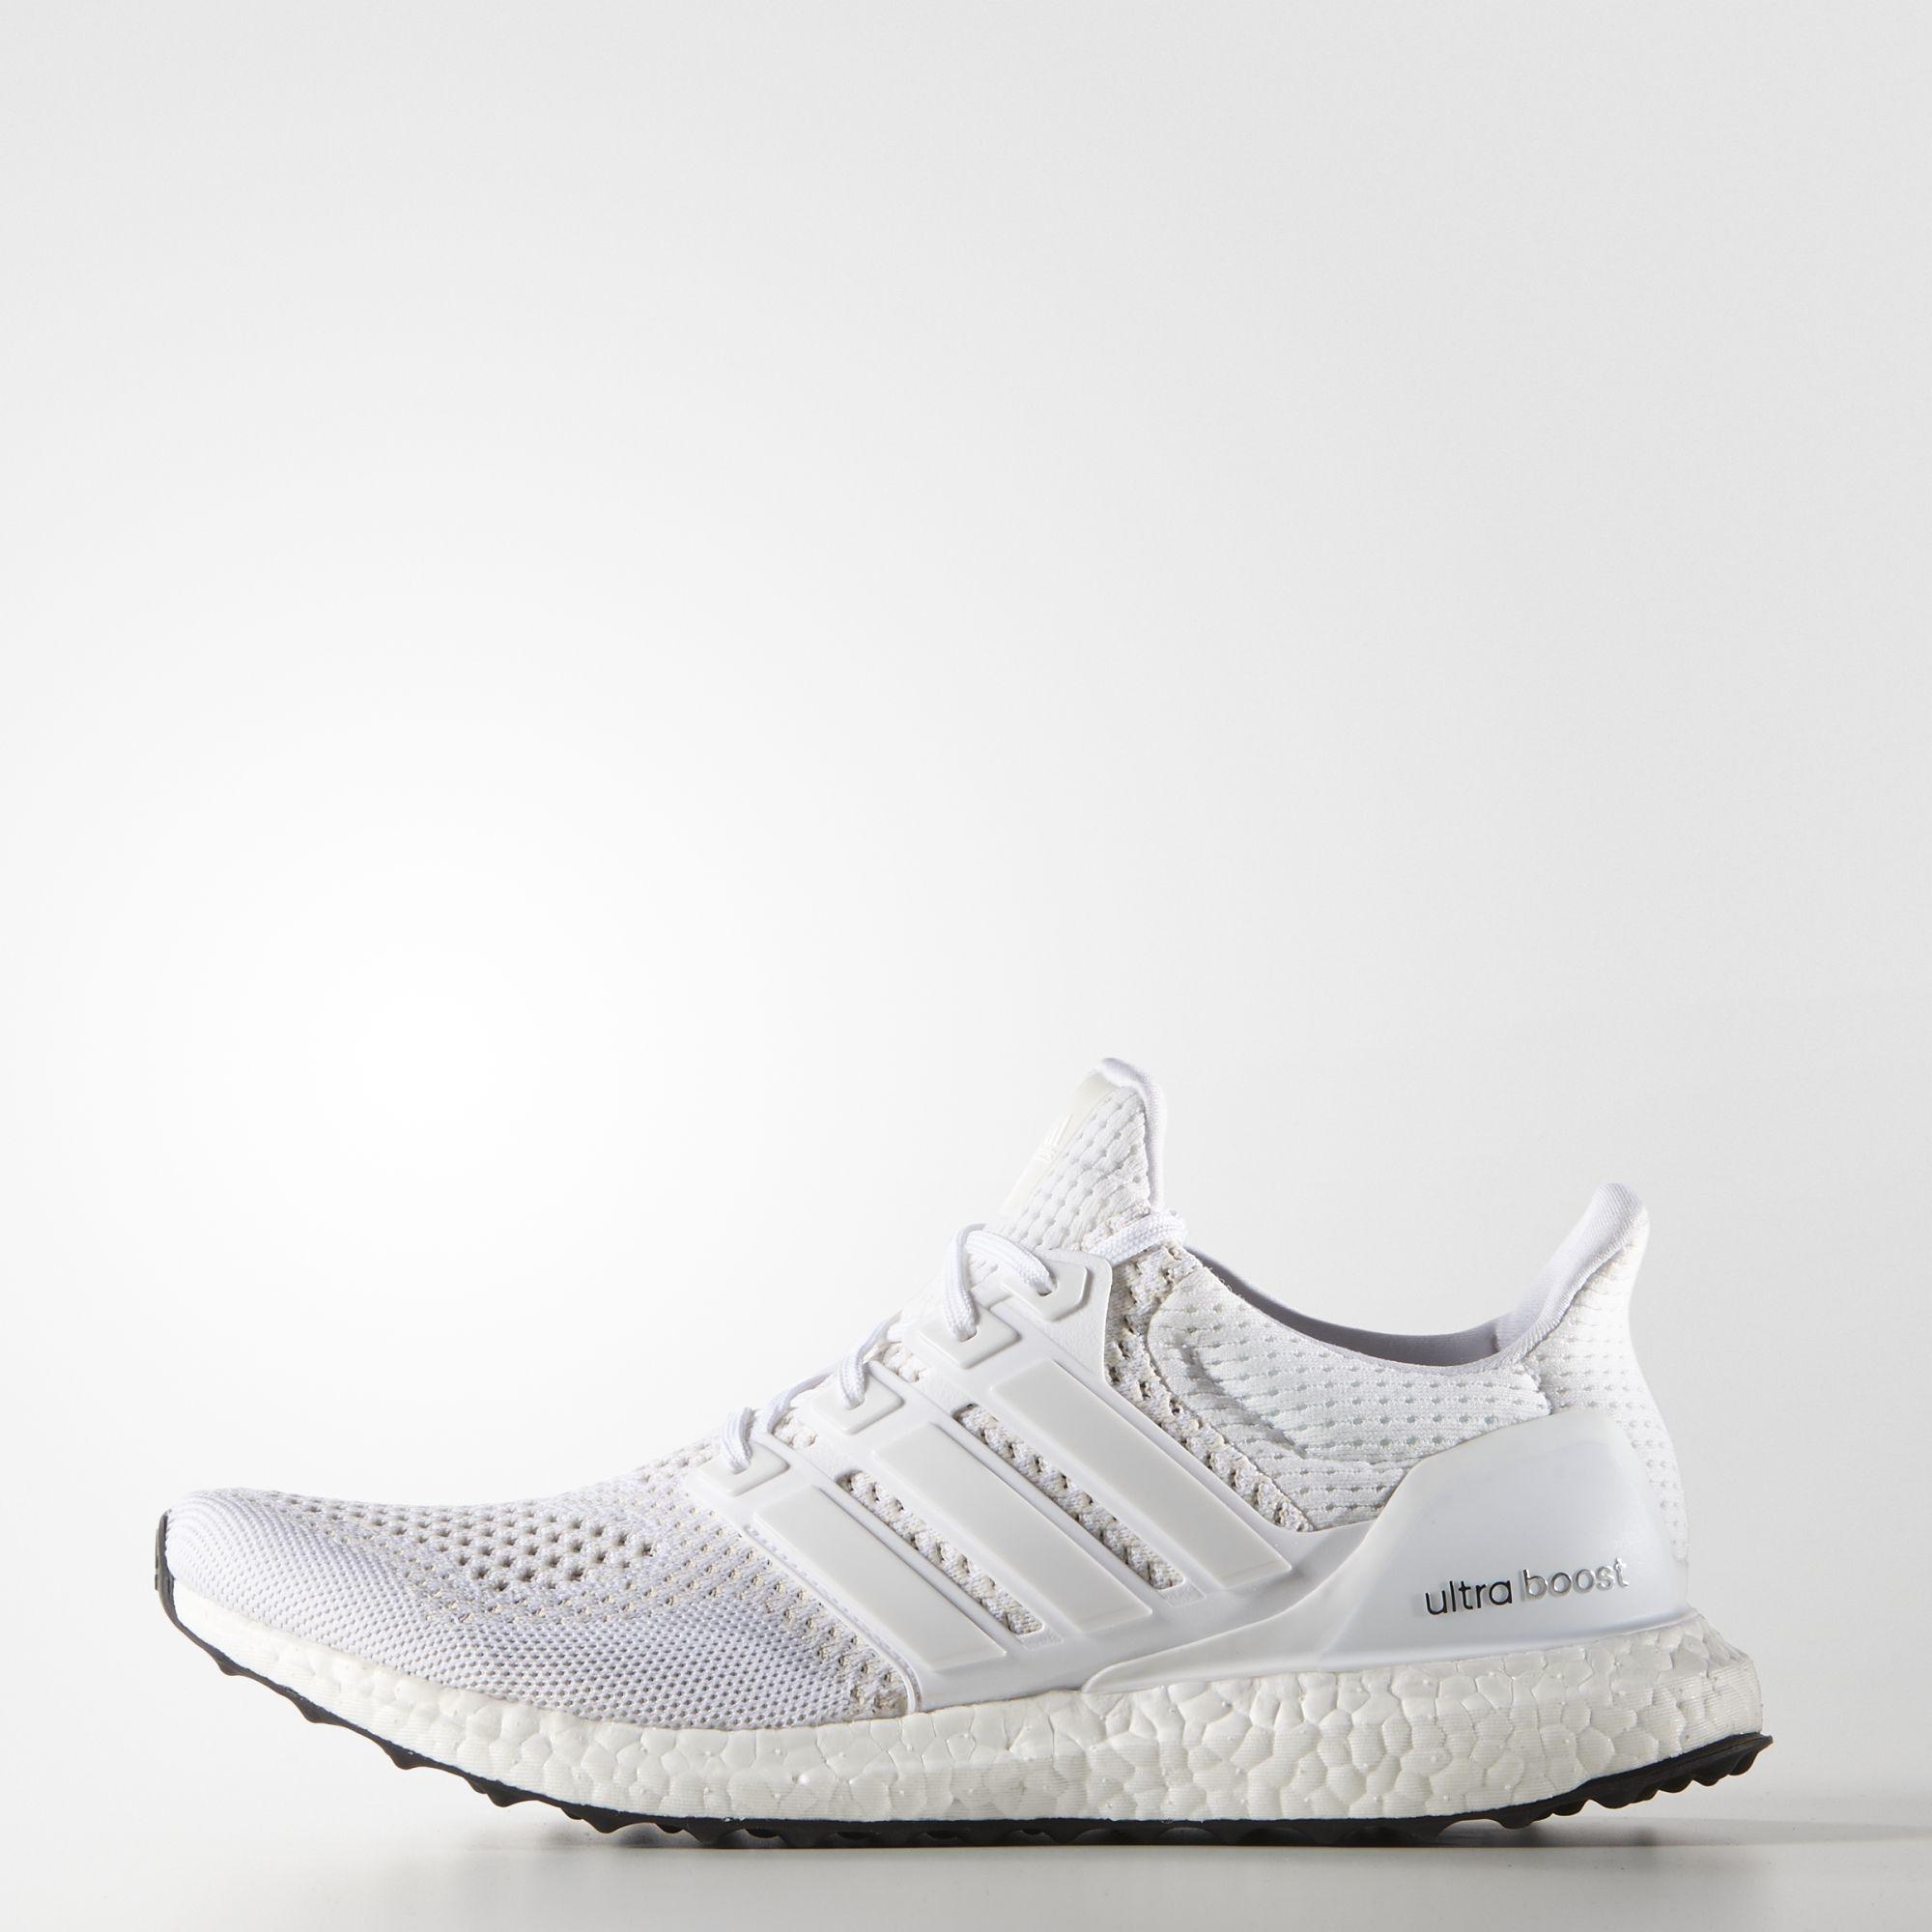 adidas Ultra Boost Triple White S77416 1